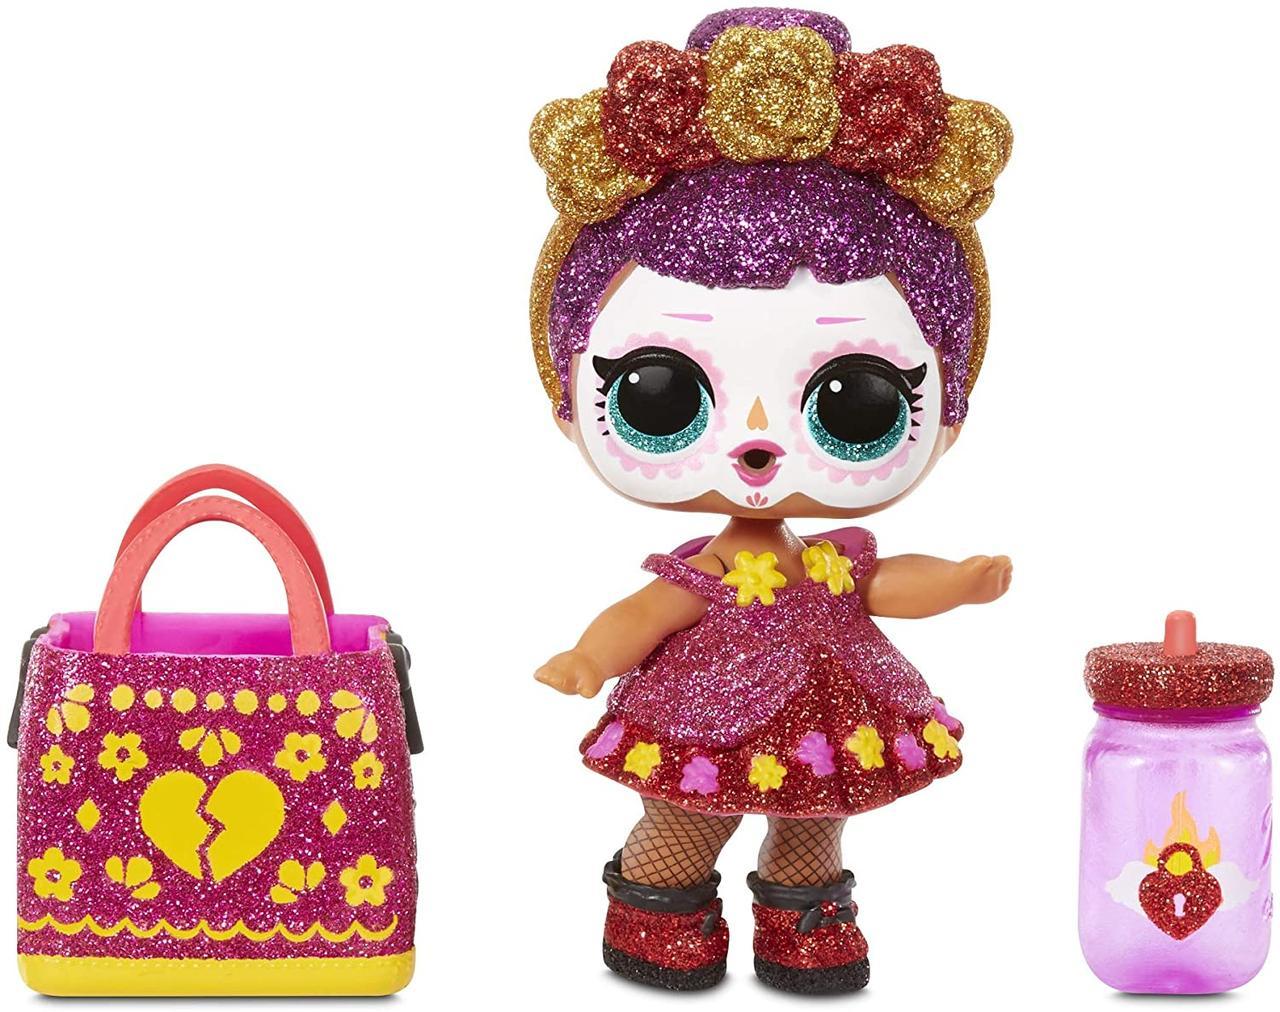 Кукла ЛОЛ Бонита Хеллоуин L.O.L. Surprise! Spooky Sparkle Limited Edition Bebé Bonita with 7 Surprises